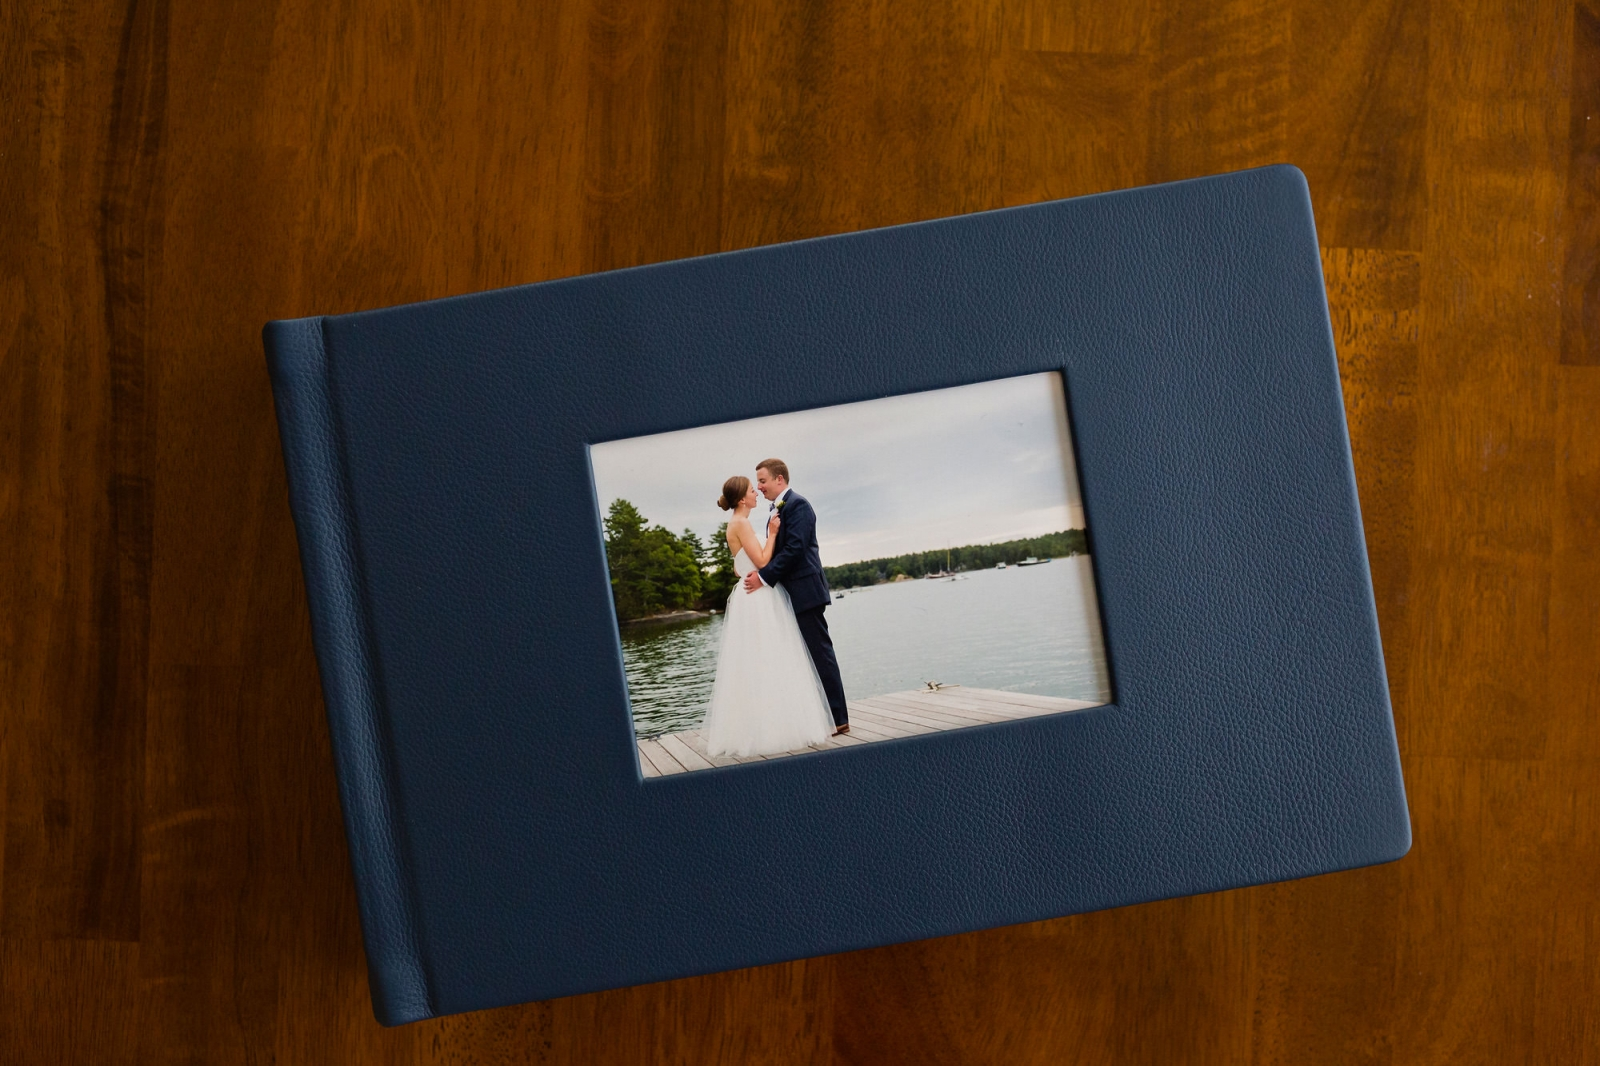 maine-wedding-albums-kc (1)